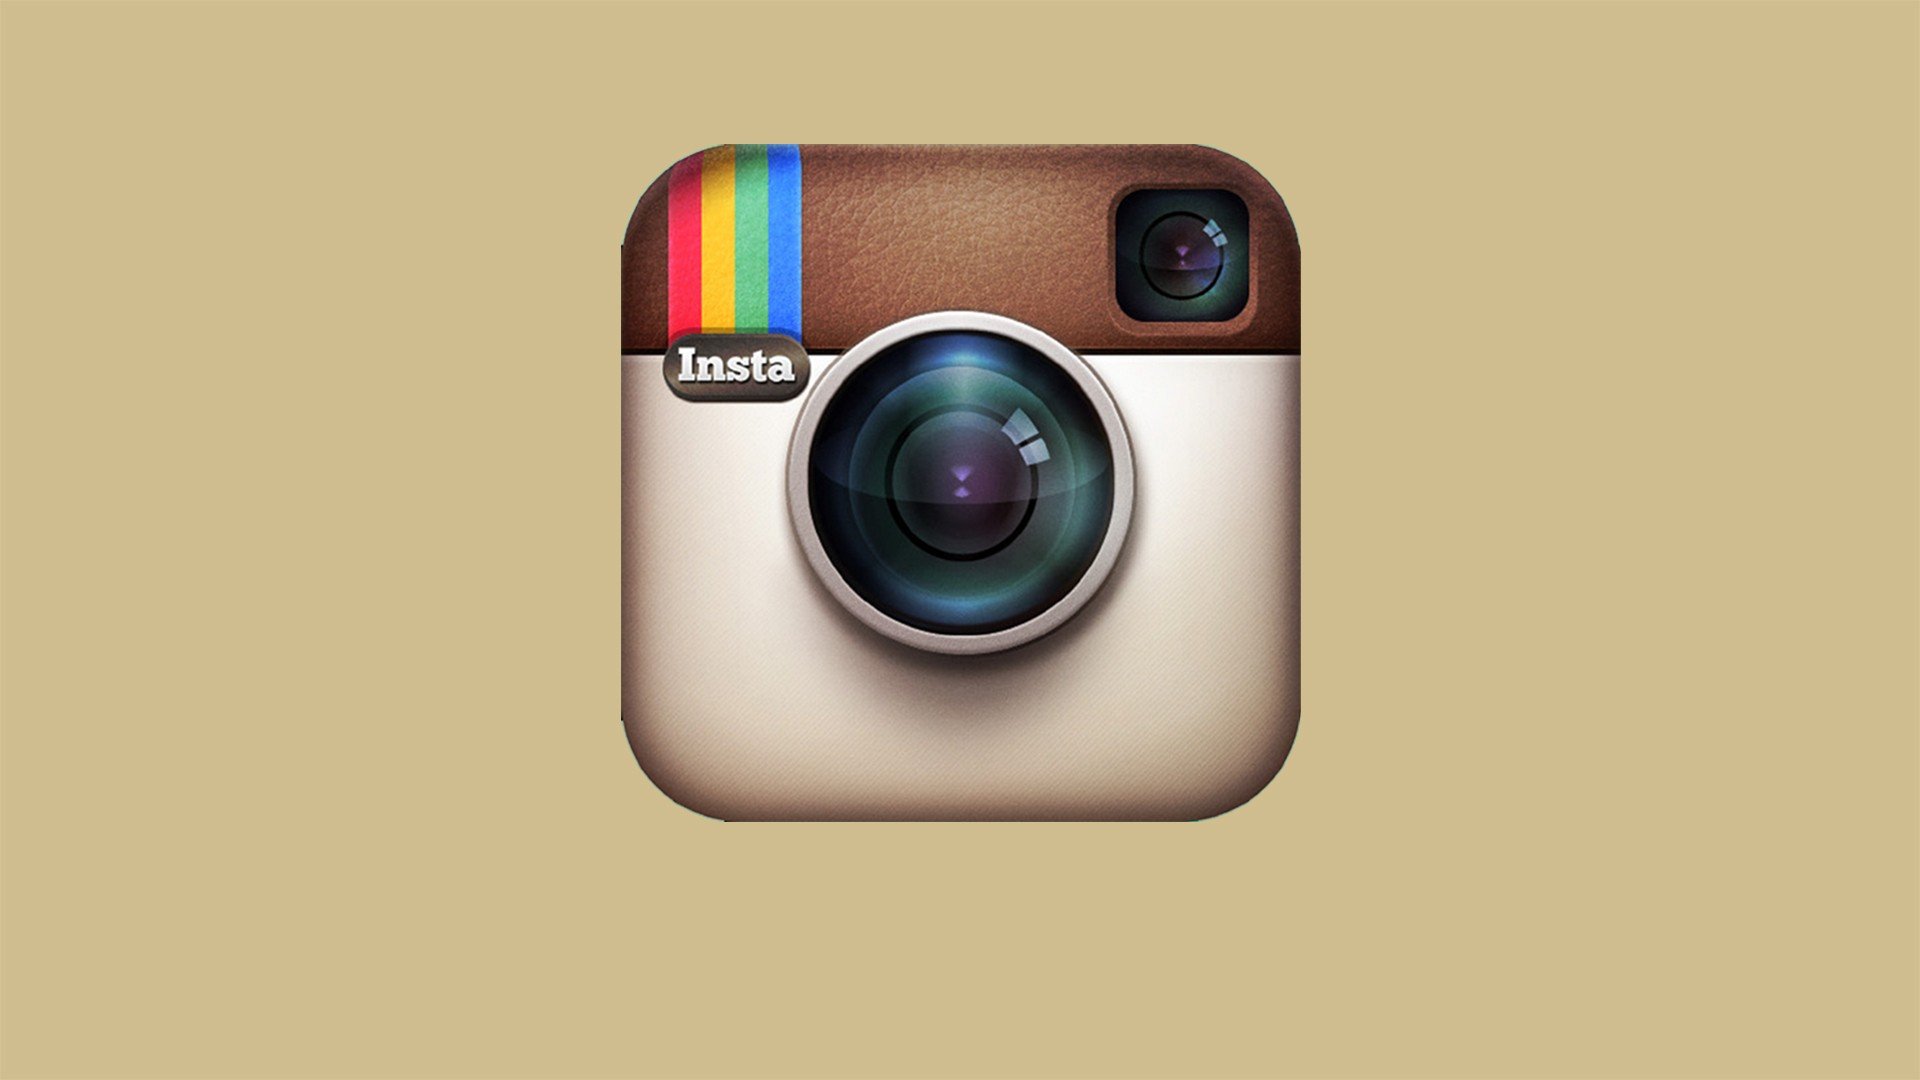 logos instagram logo symbol social site social network hd wallpaper 1920x1080